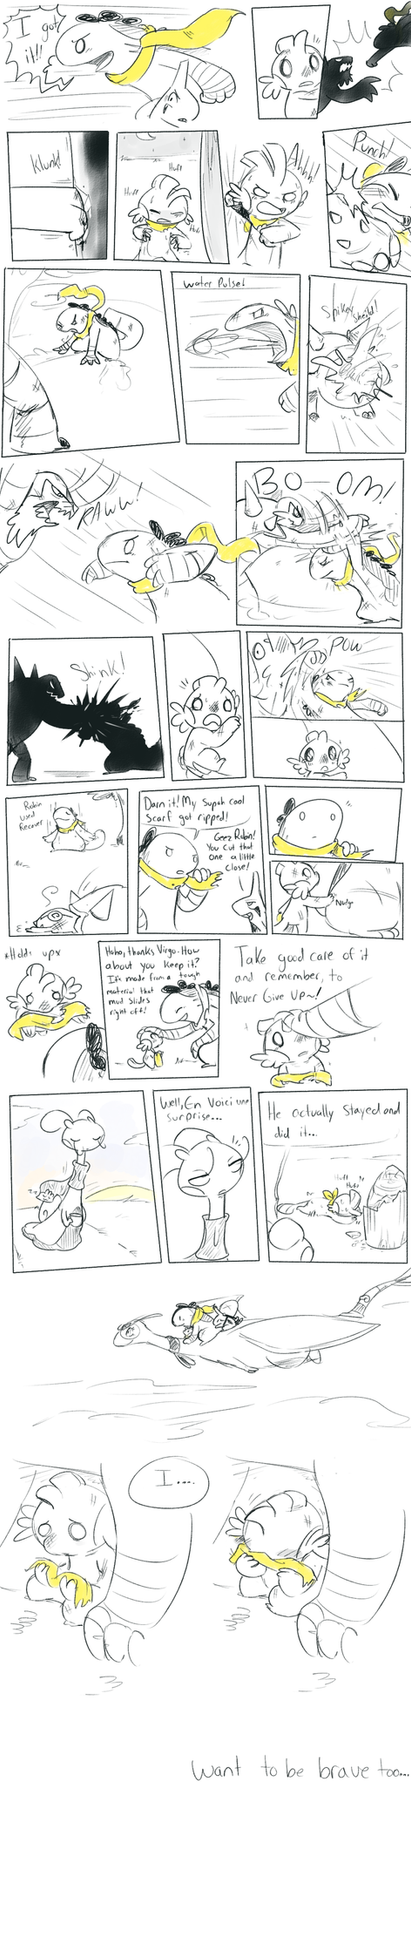 theScarf Part3 by CrazyIguana